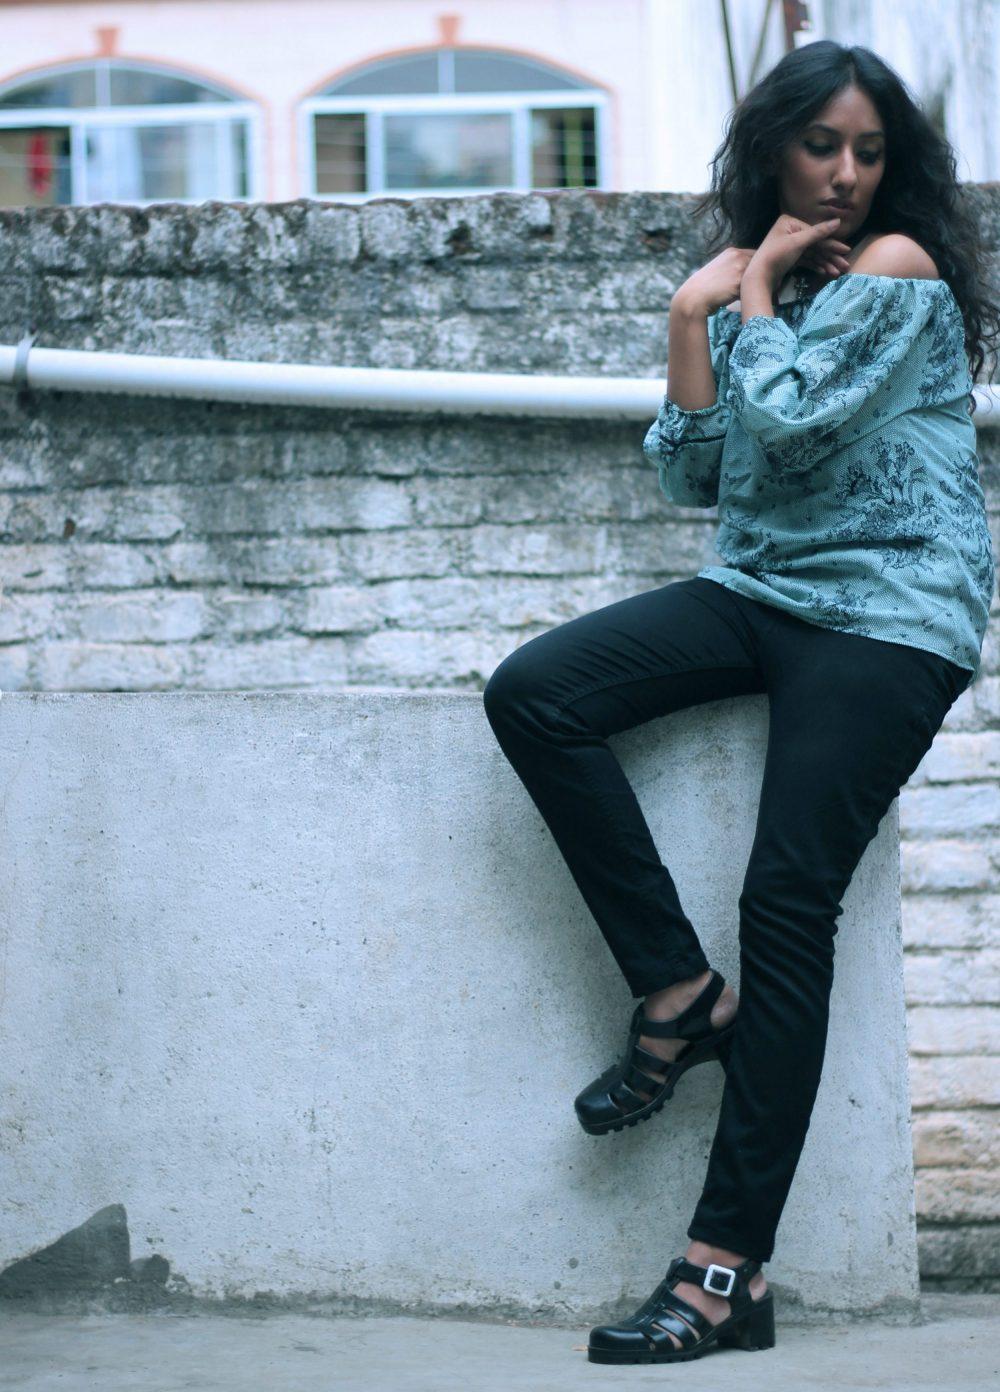 conceptual ; dark photography ; i dress for the applause ; naznin suhaer ; editorial ; monsoon ; rain ; dusky ; fashion ; beauty ; bardot top ; off the shoulder ; fashion blogger ; indian fashion blogger ; hyderabad fashion blogger ;